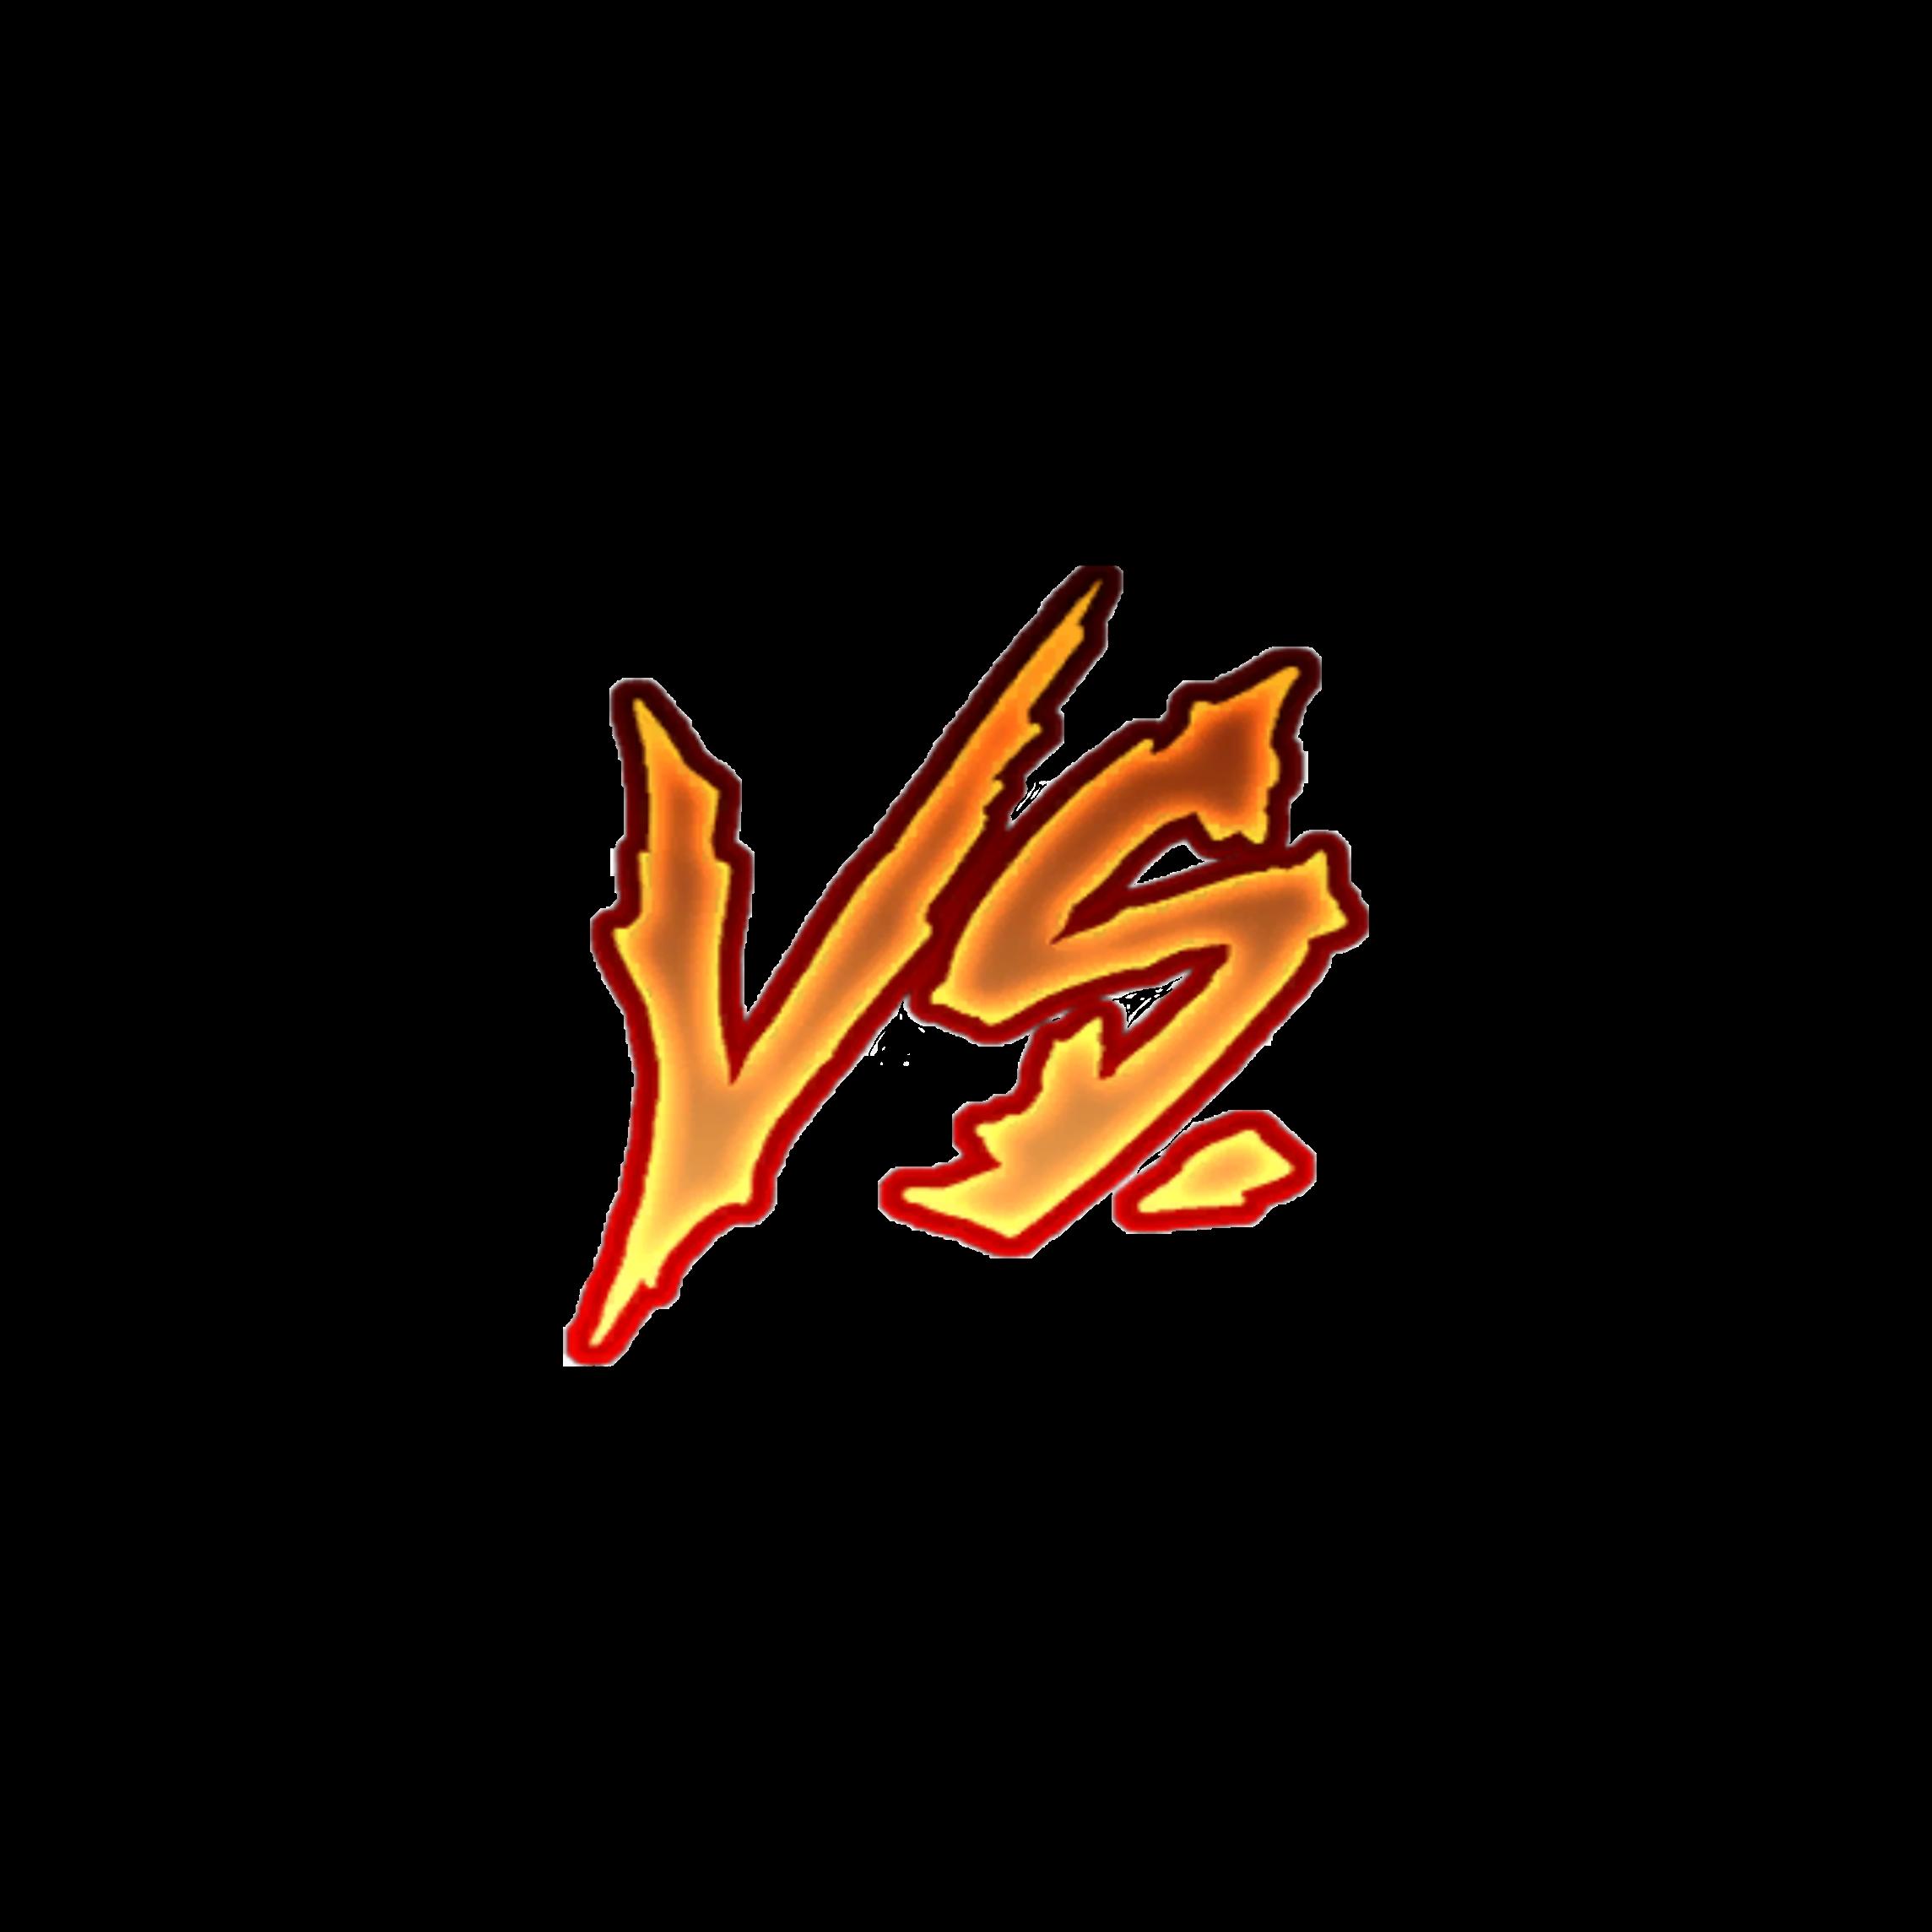 Freetoedit Vs Versus Png Remixit Desenhos Dragonball Desenhos Aleatorios Paisagem Desenho